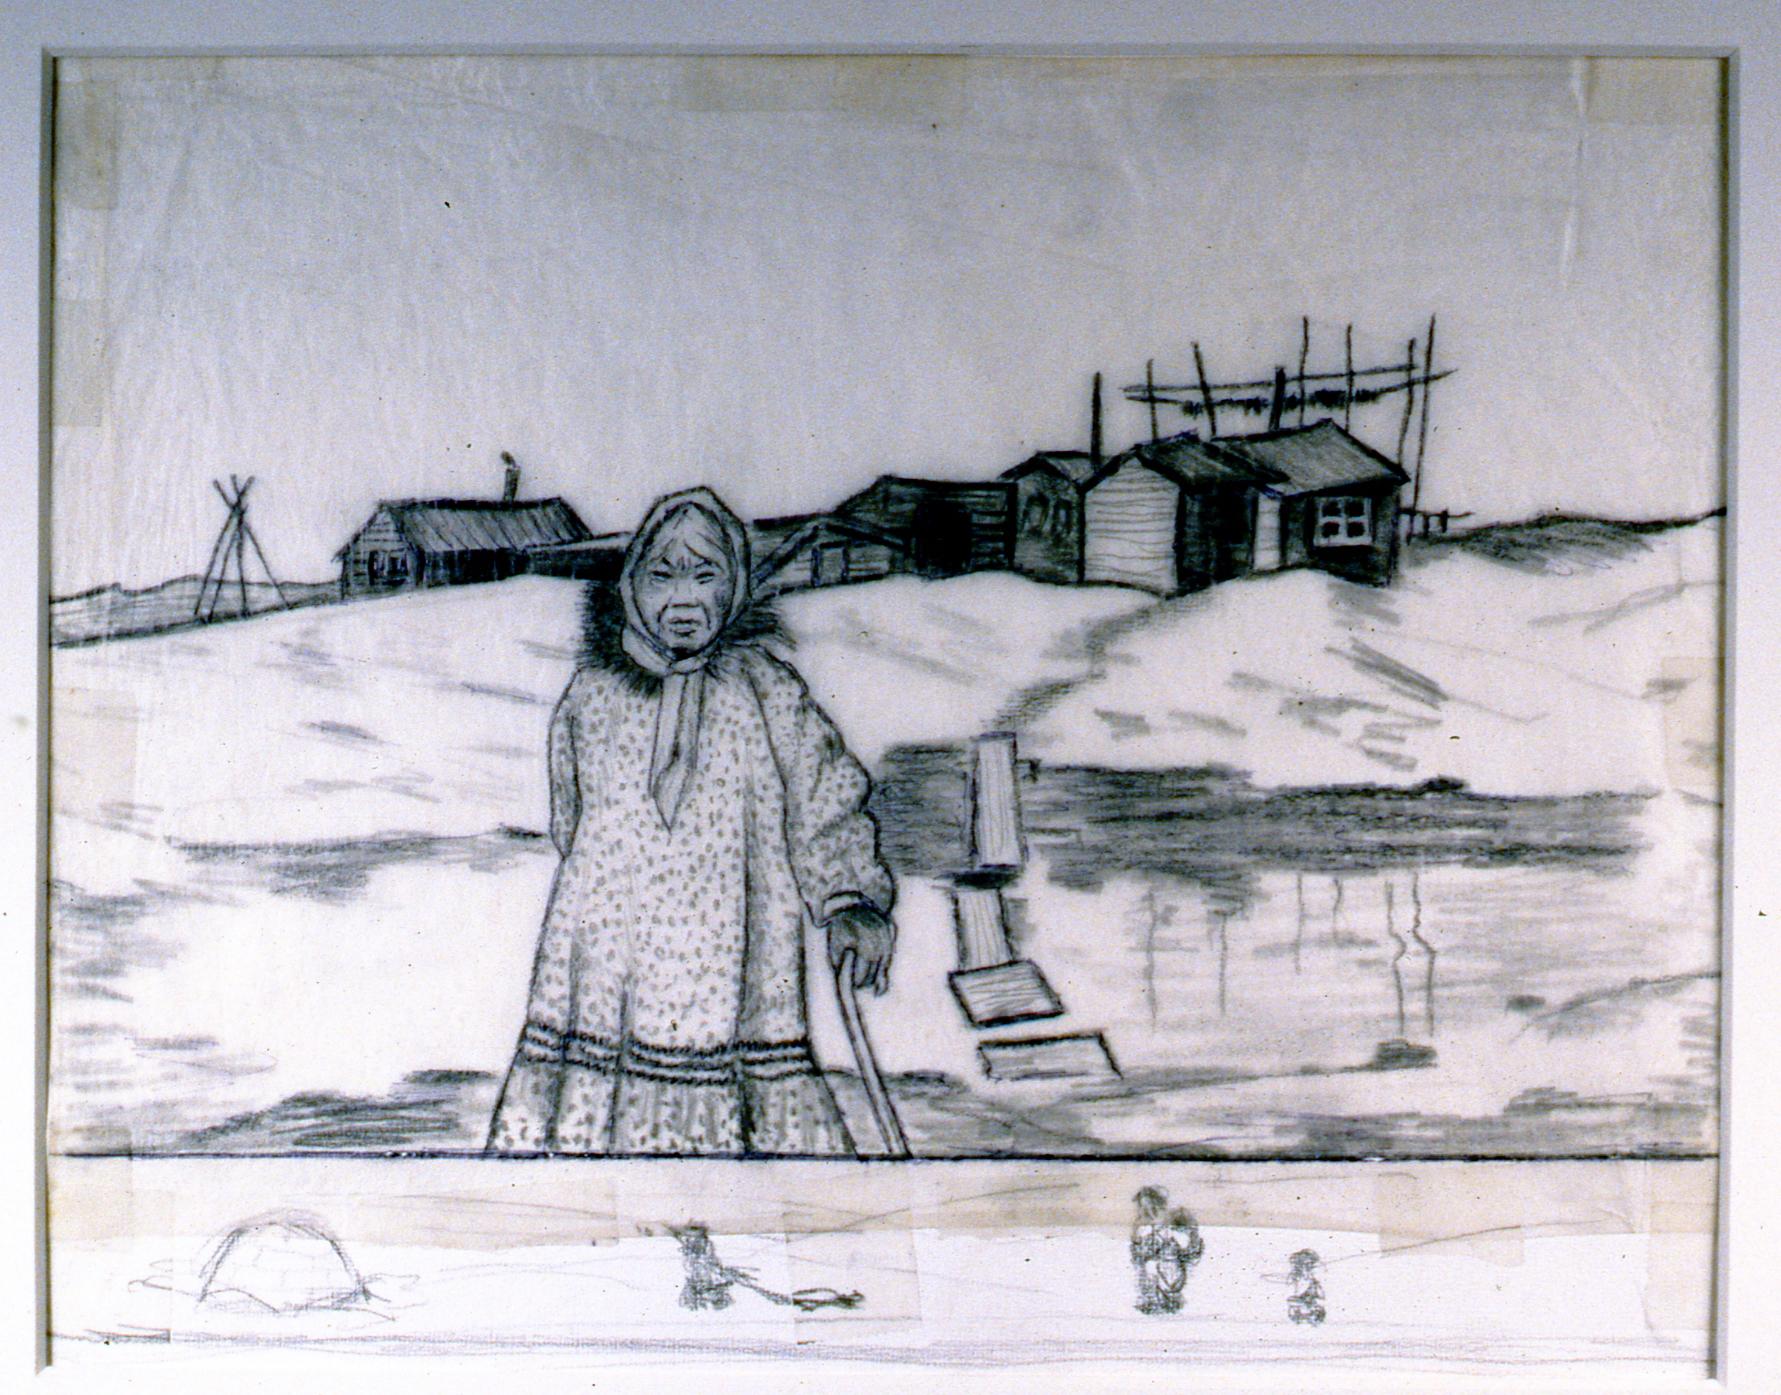 Spring Walk , 1986, Minn Sjølseth, sketch, 21.5 x 25.5 cm, 1996.02.23